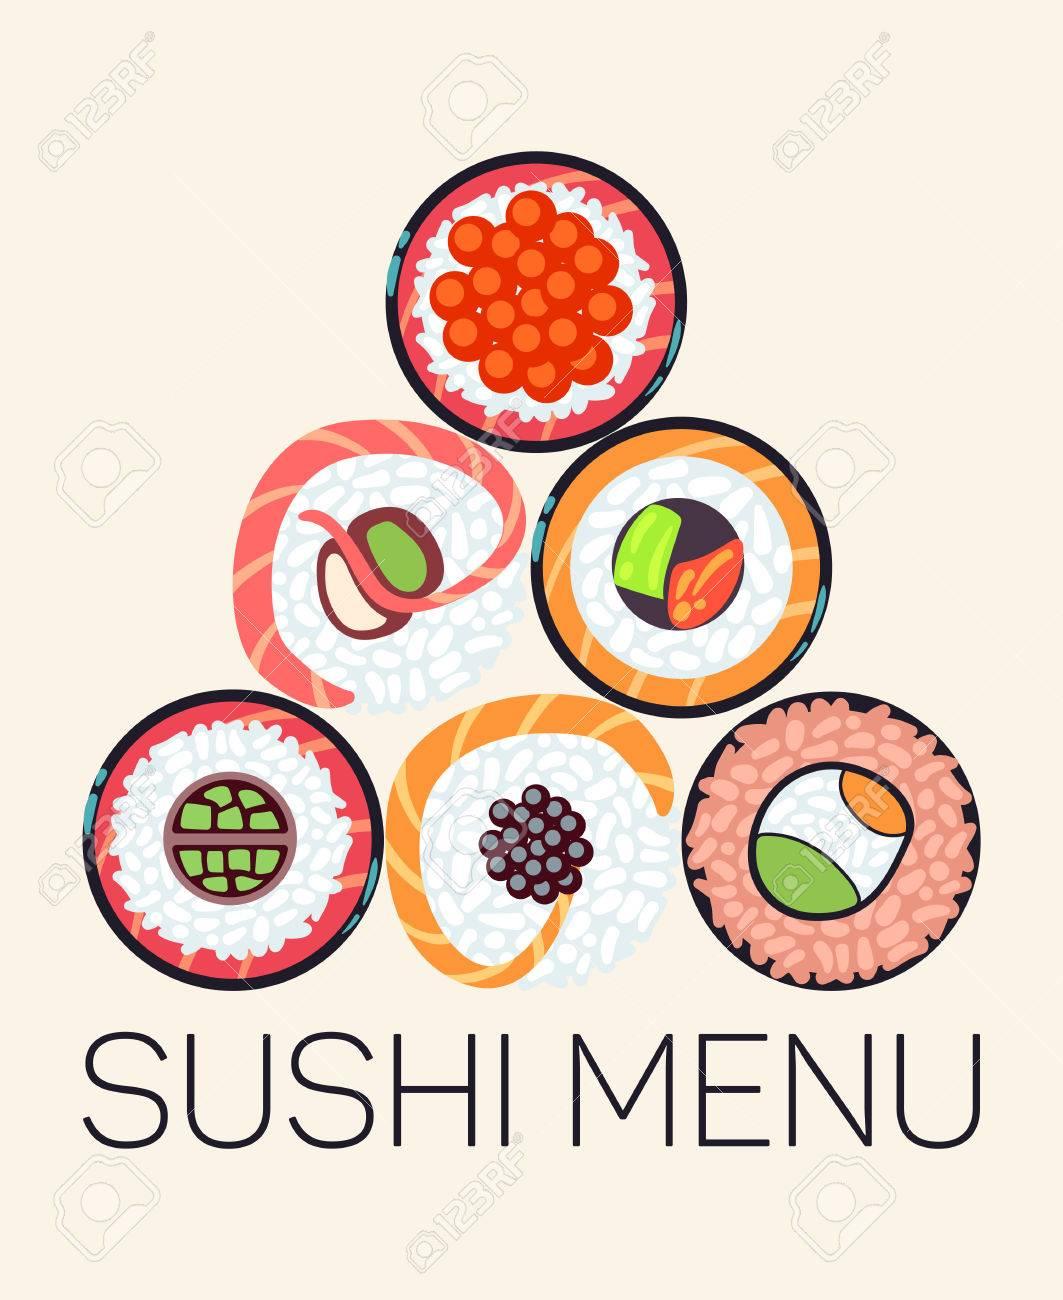 1063x1300 Japanese Restaurant Sushi Menu Template. Asian Menu With Roll